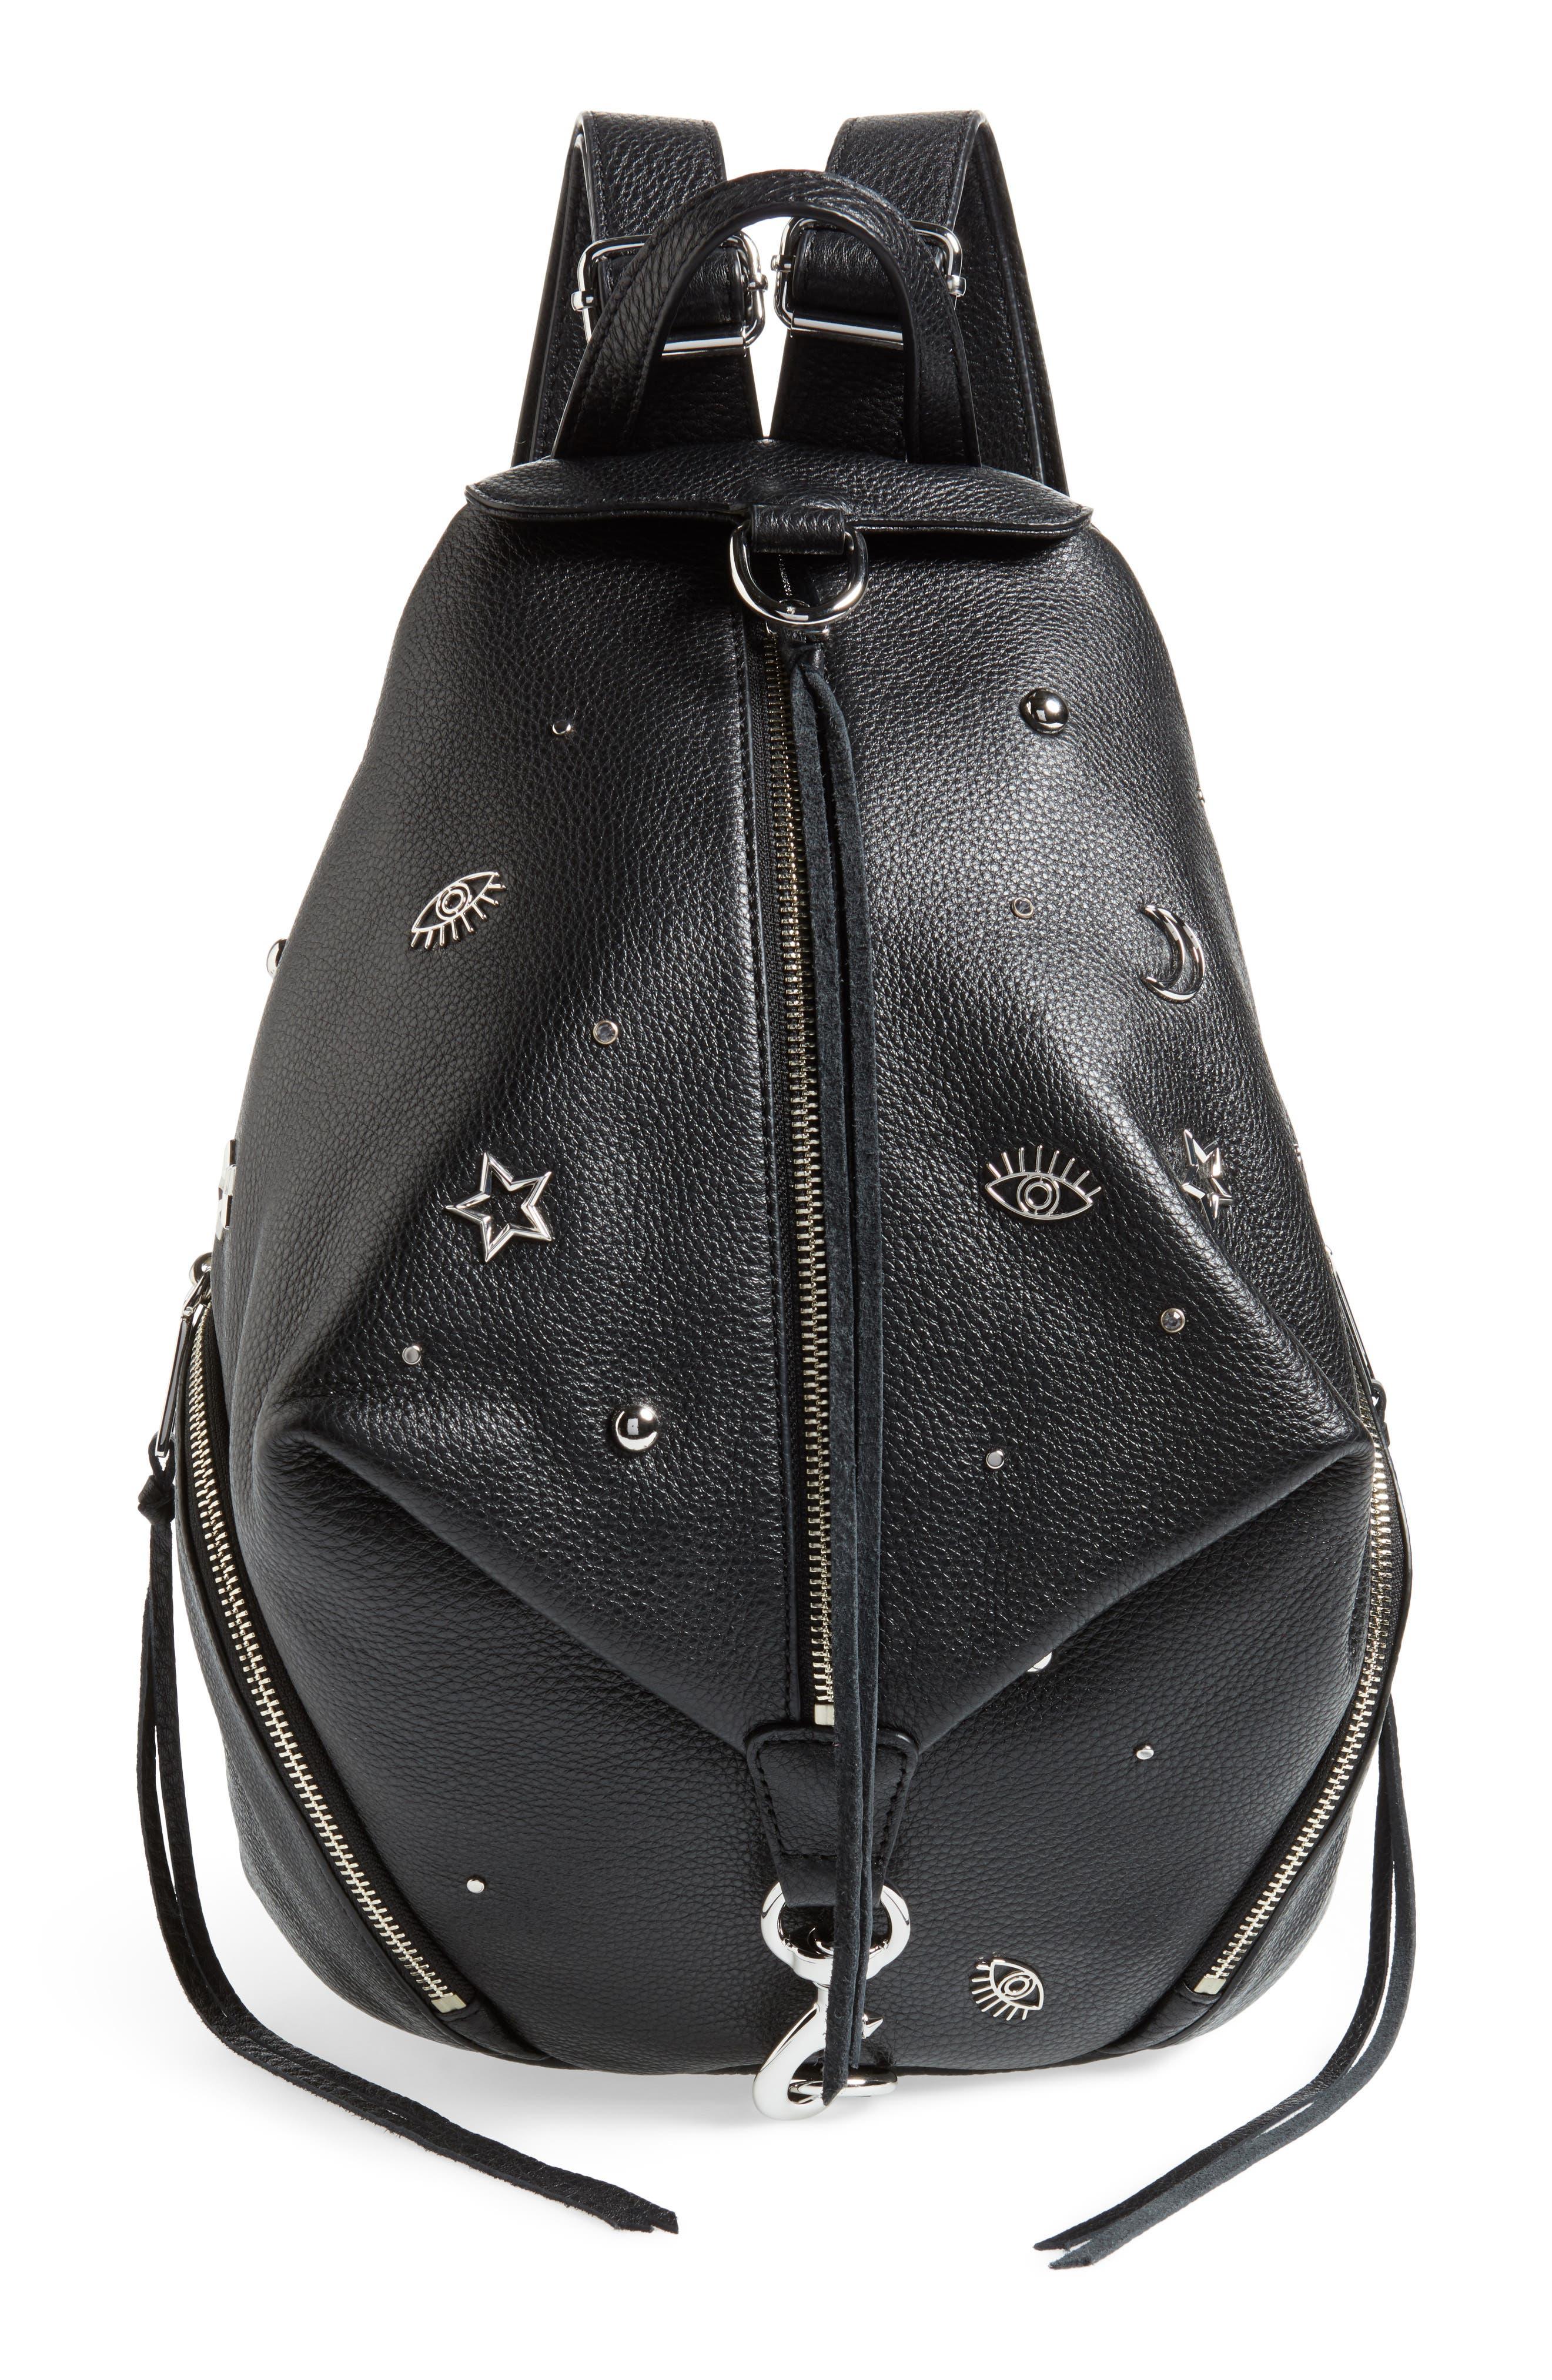 Julian Embellished Leather Backpack,                             Main thumbnail 1, color,                             Black